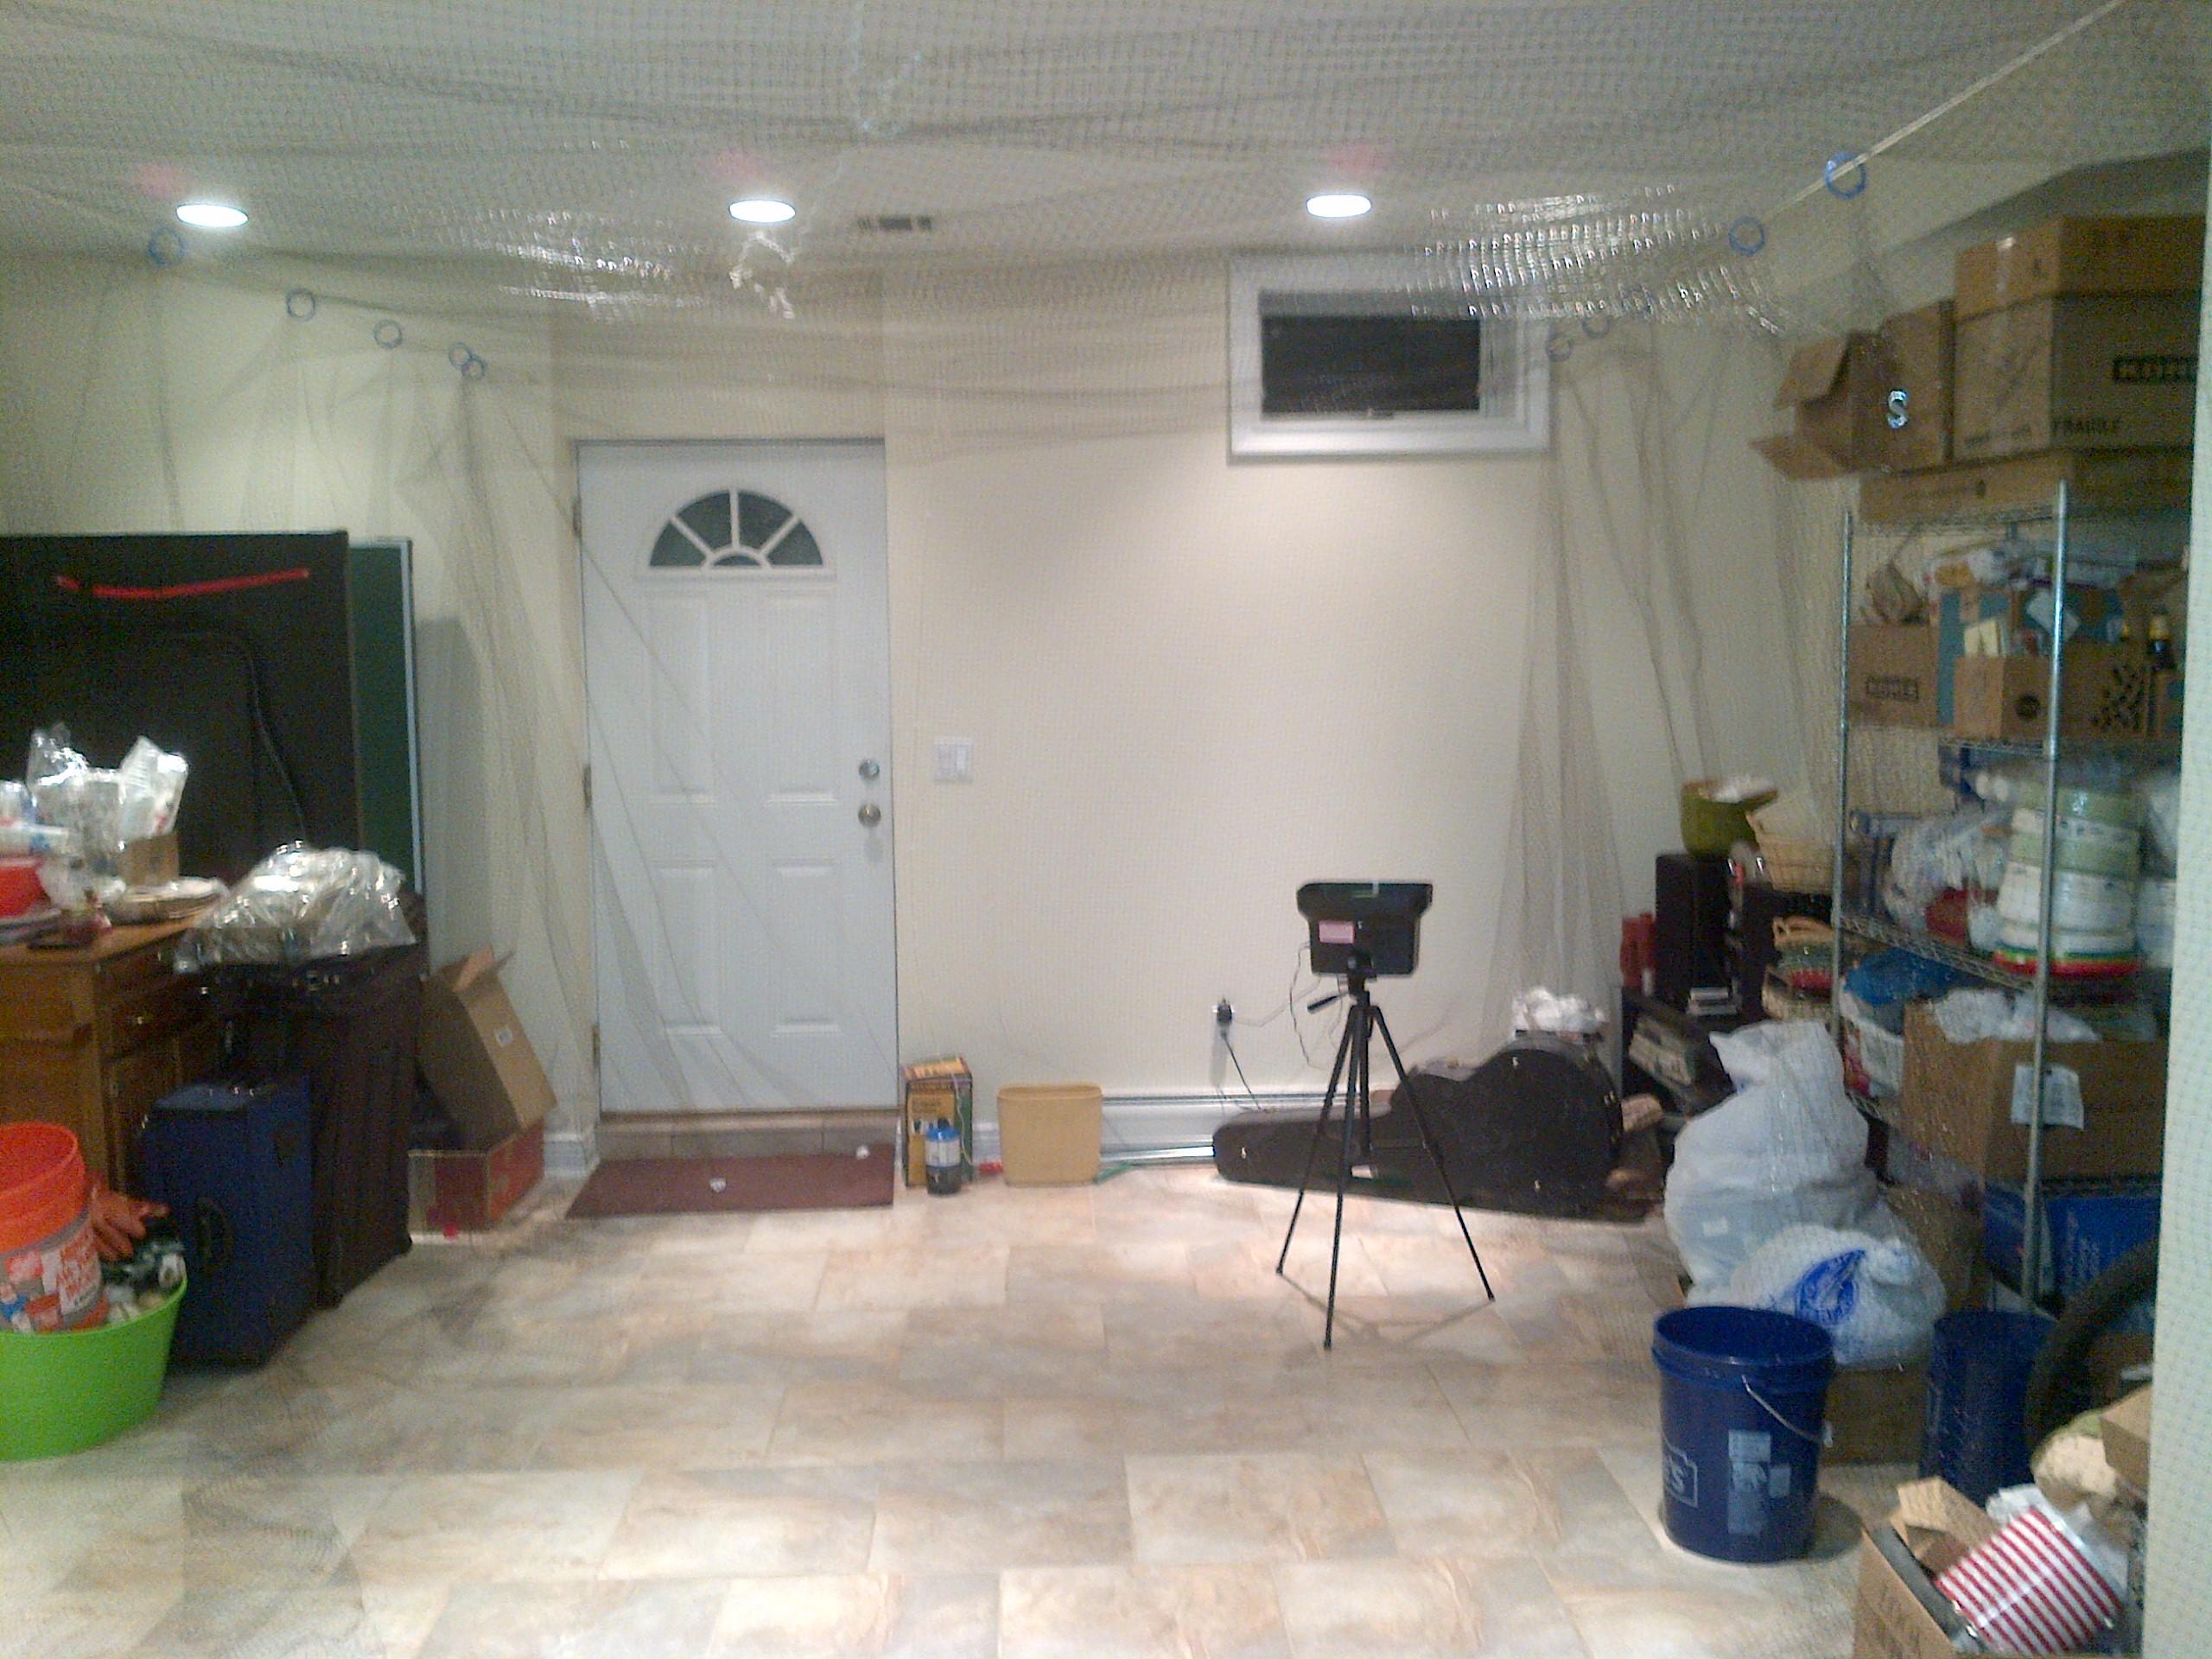 david-n-basement-cage-2.jpg